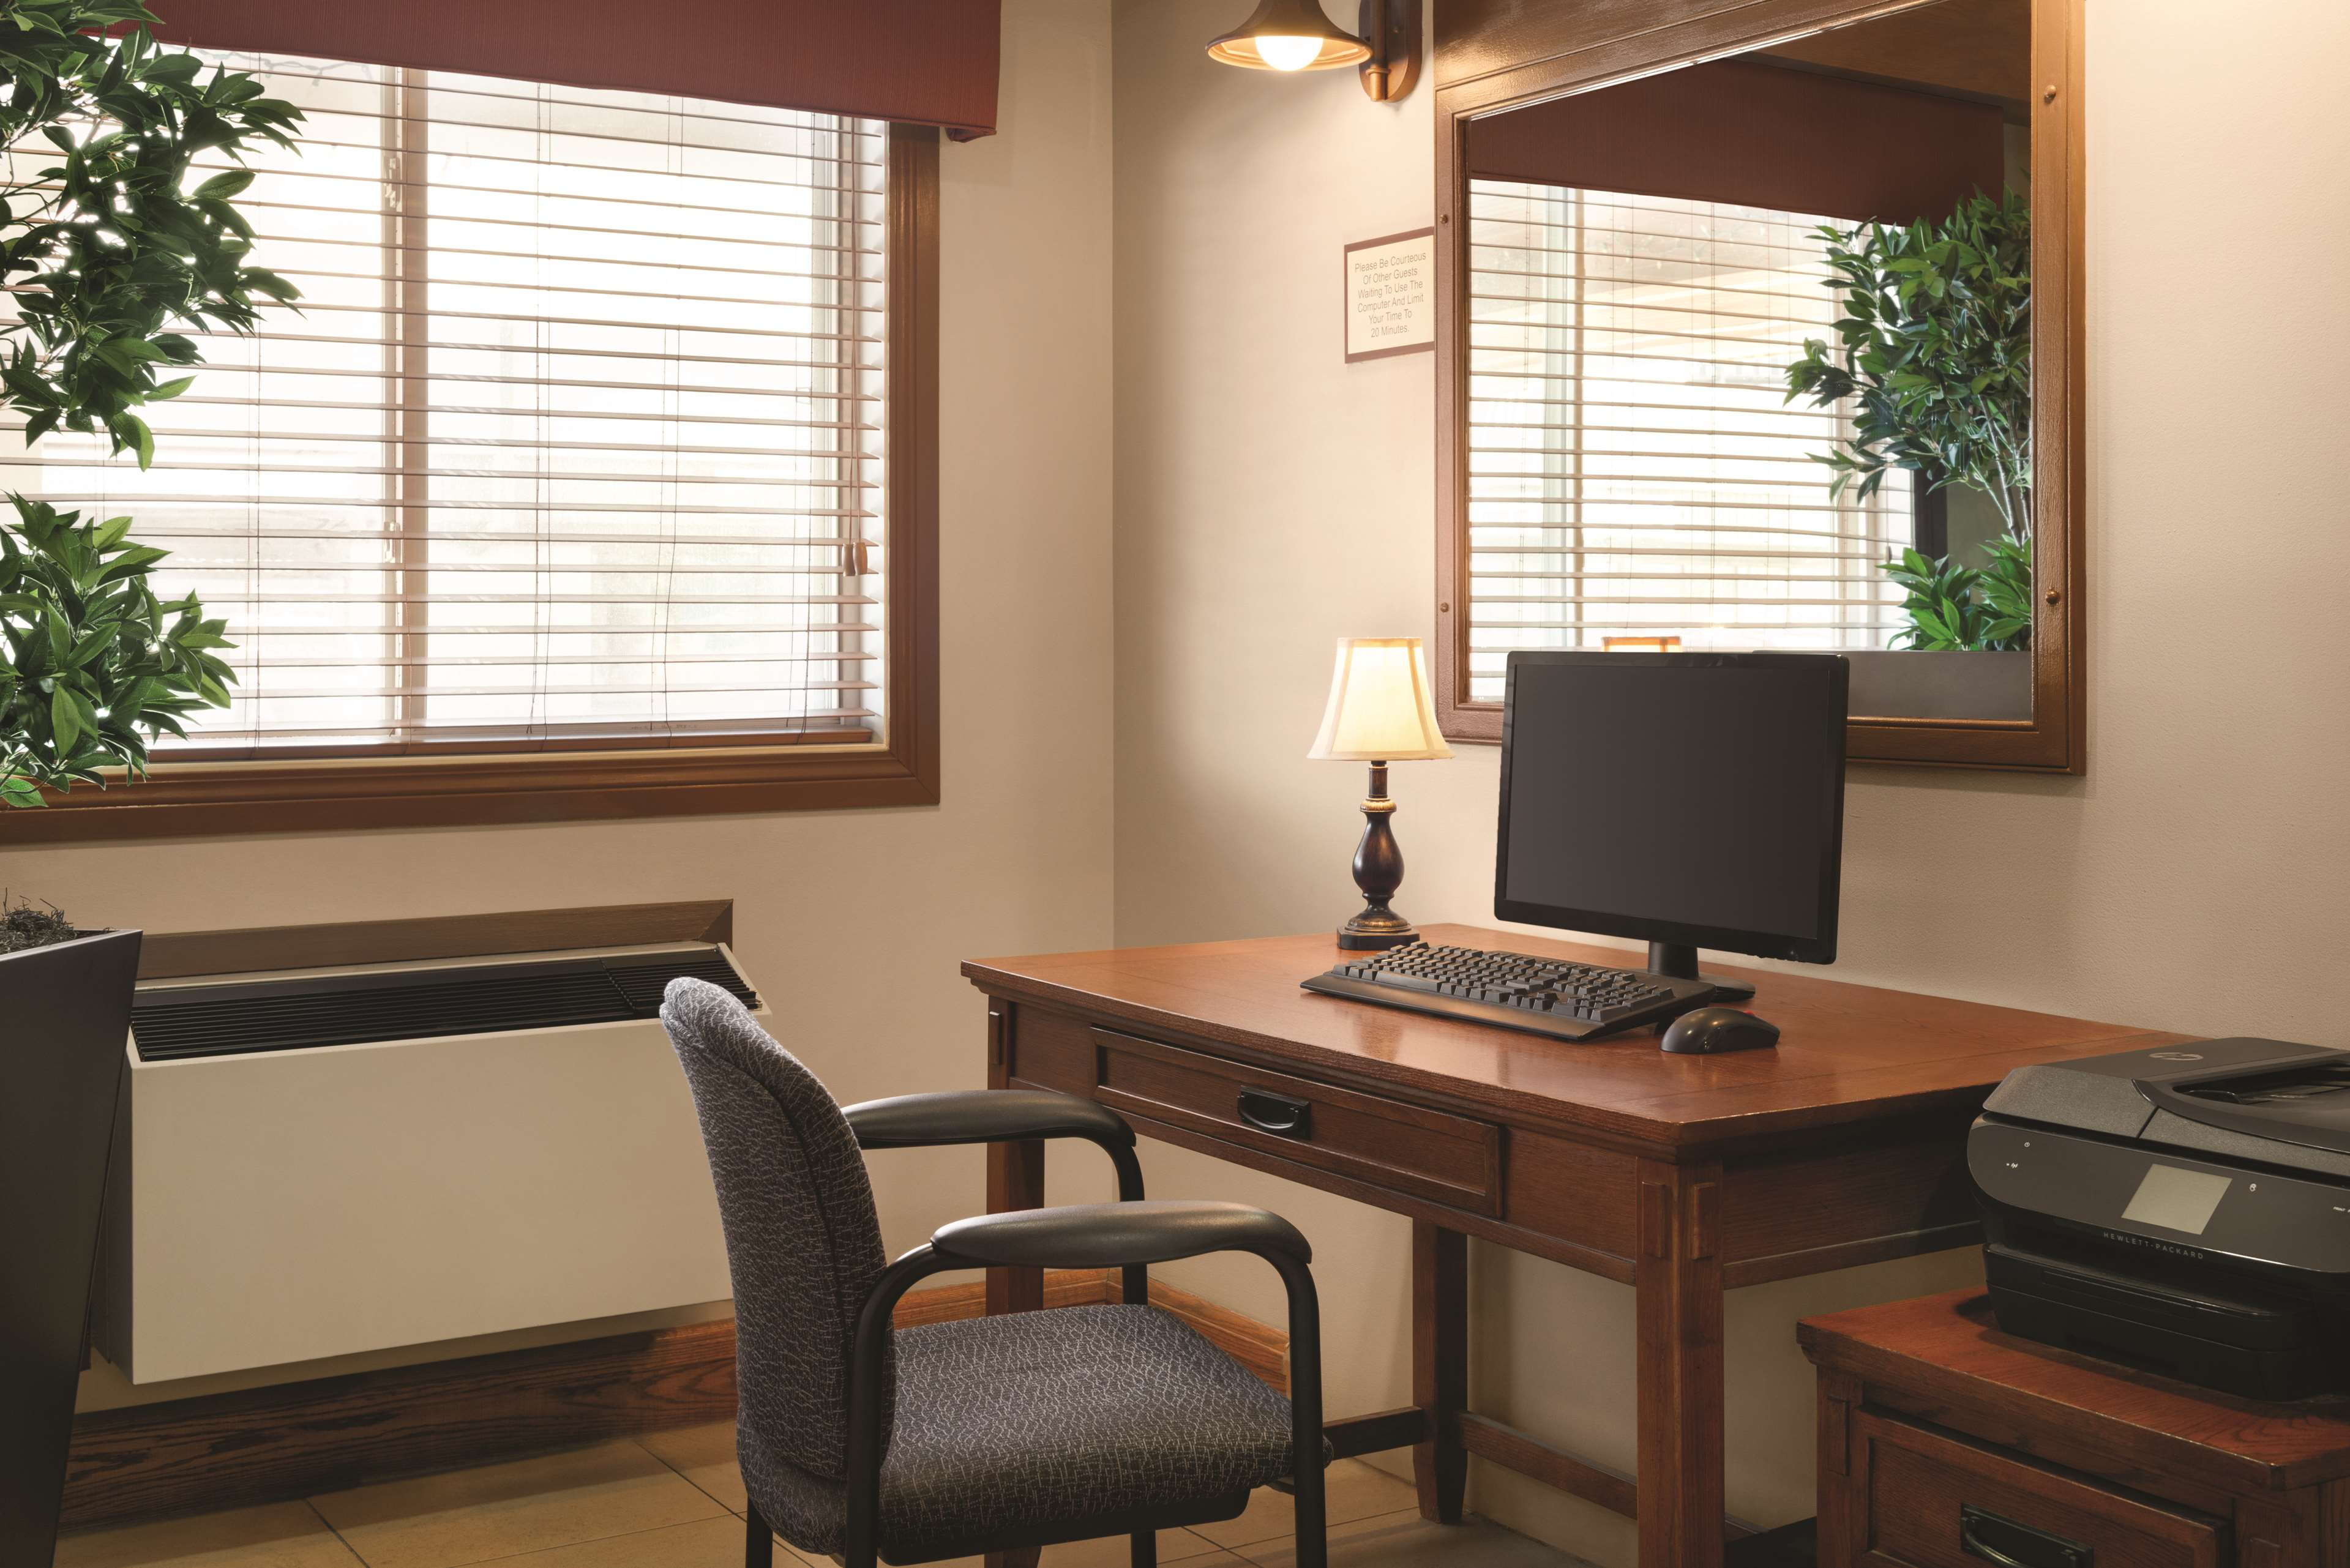 Country Inn & Suites by Radisson, Saskatoon, SK in Saskatoon: Business Center